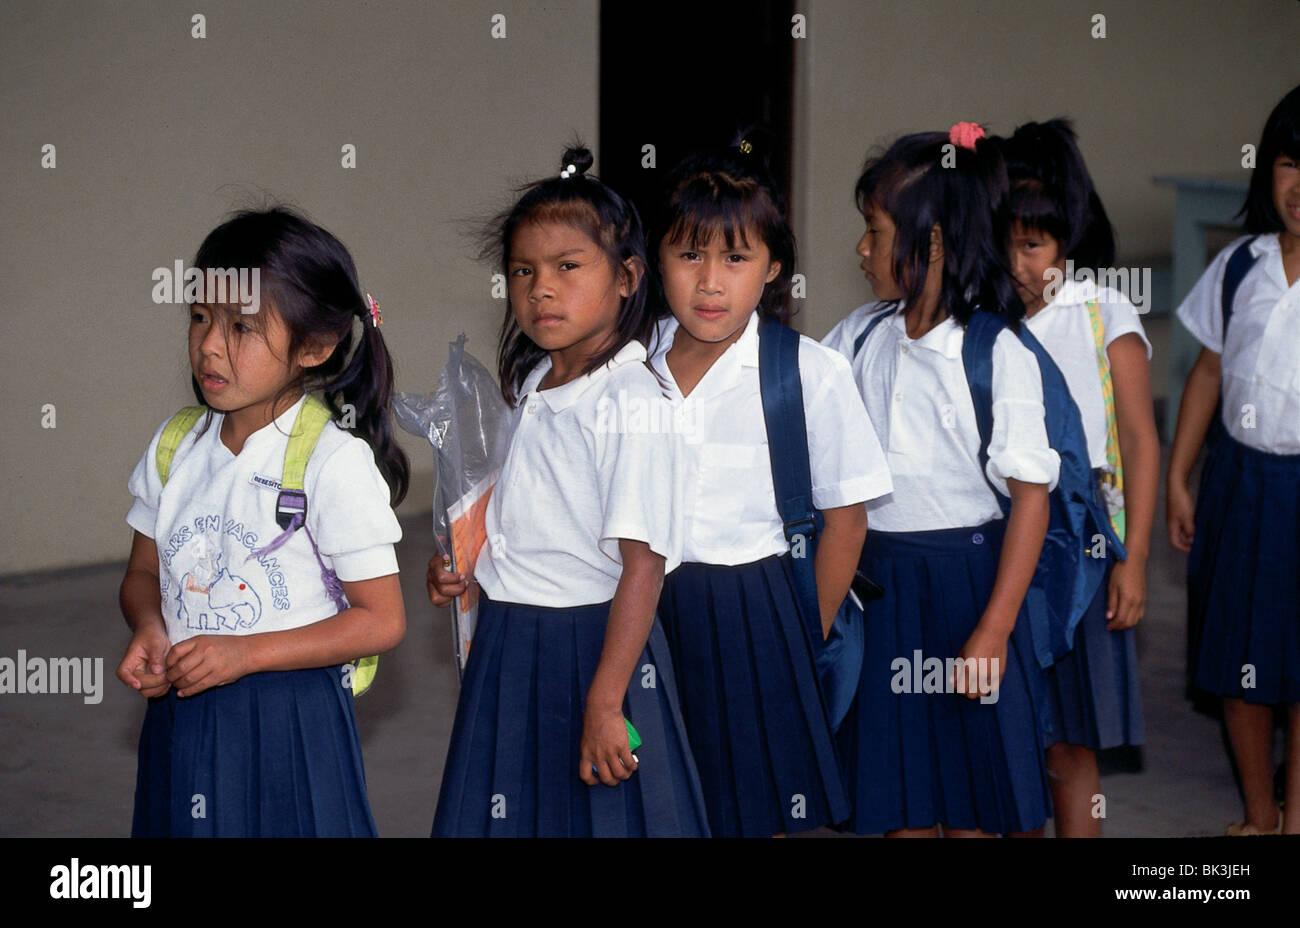 be03ea54c7a0 Indian Village School, Capuchina Mission Students in Uniforms, Venezuela